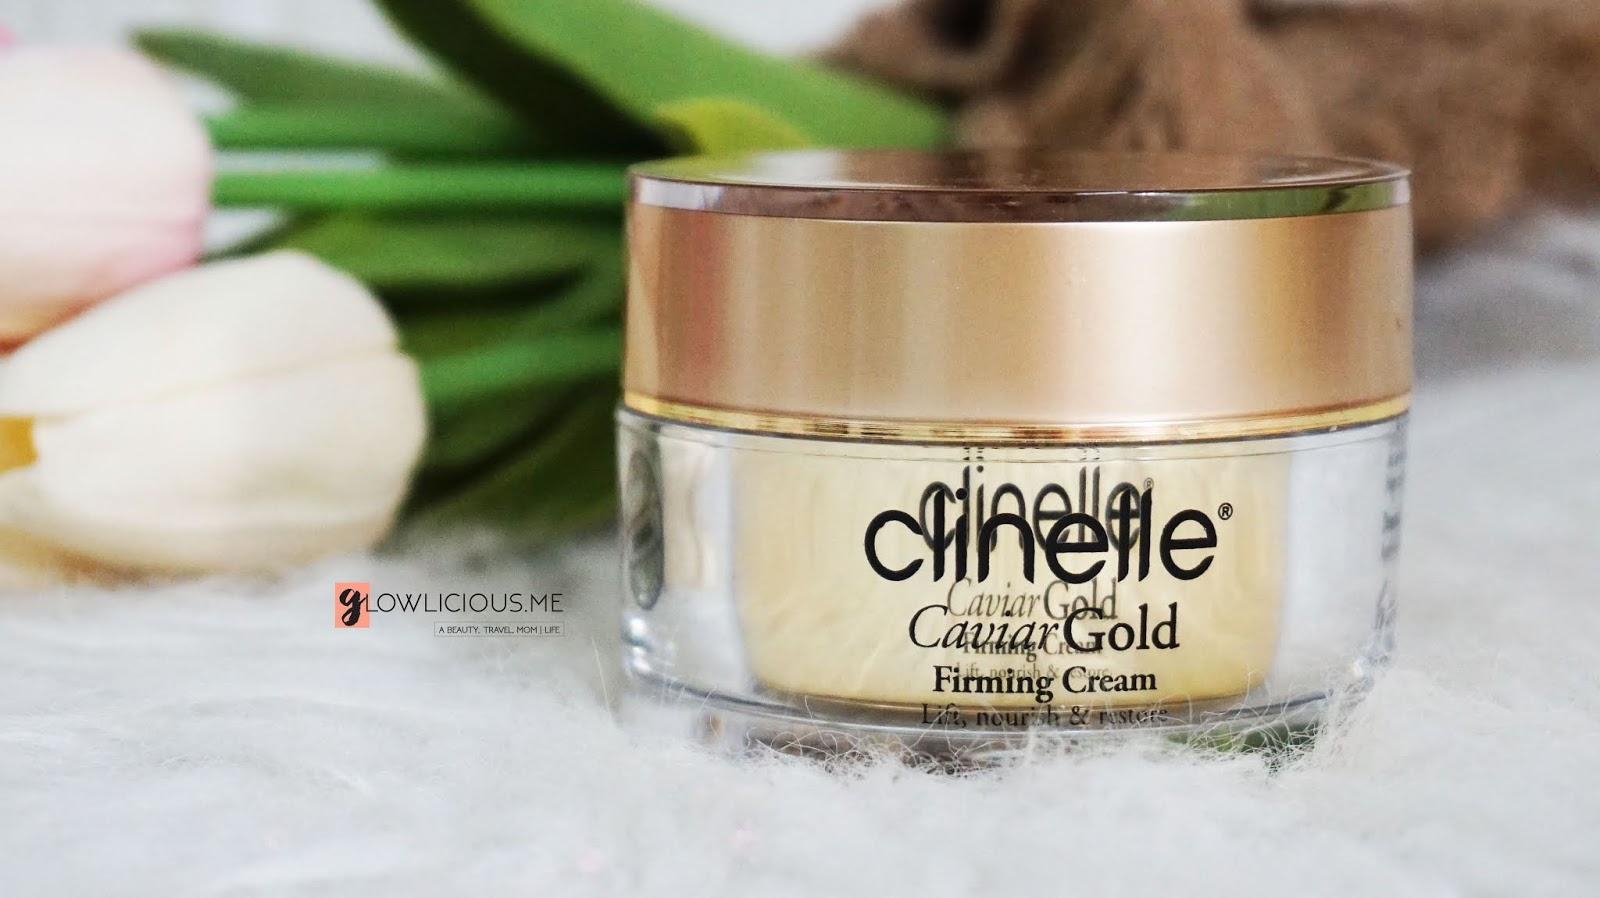 Clinelle Caviar Gold Firming Cream